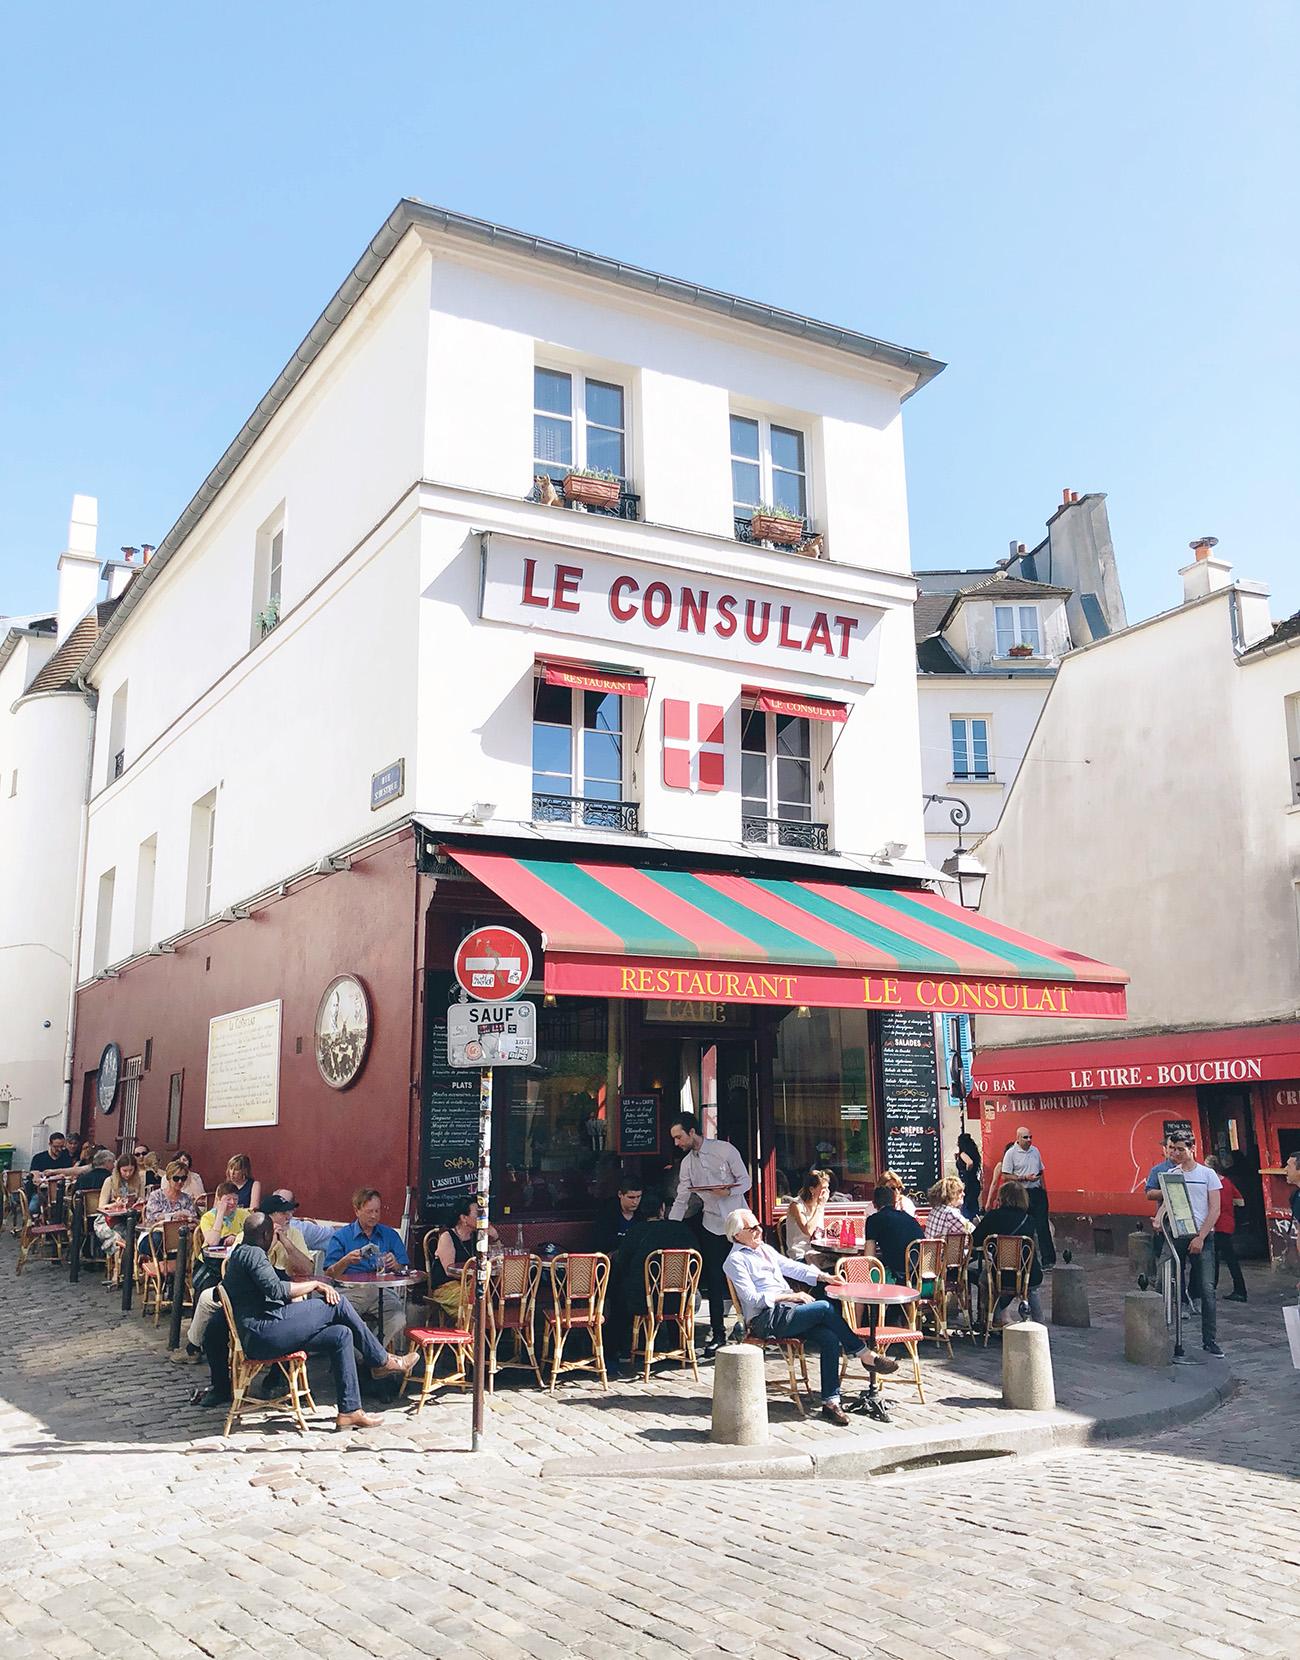 Le Consulat Montmarte